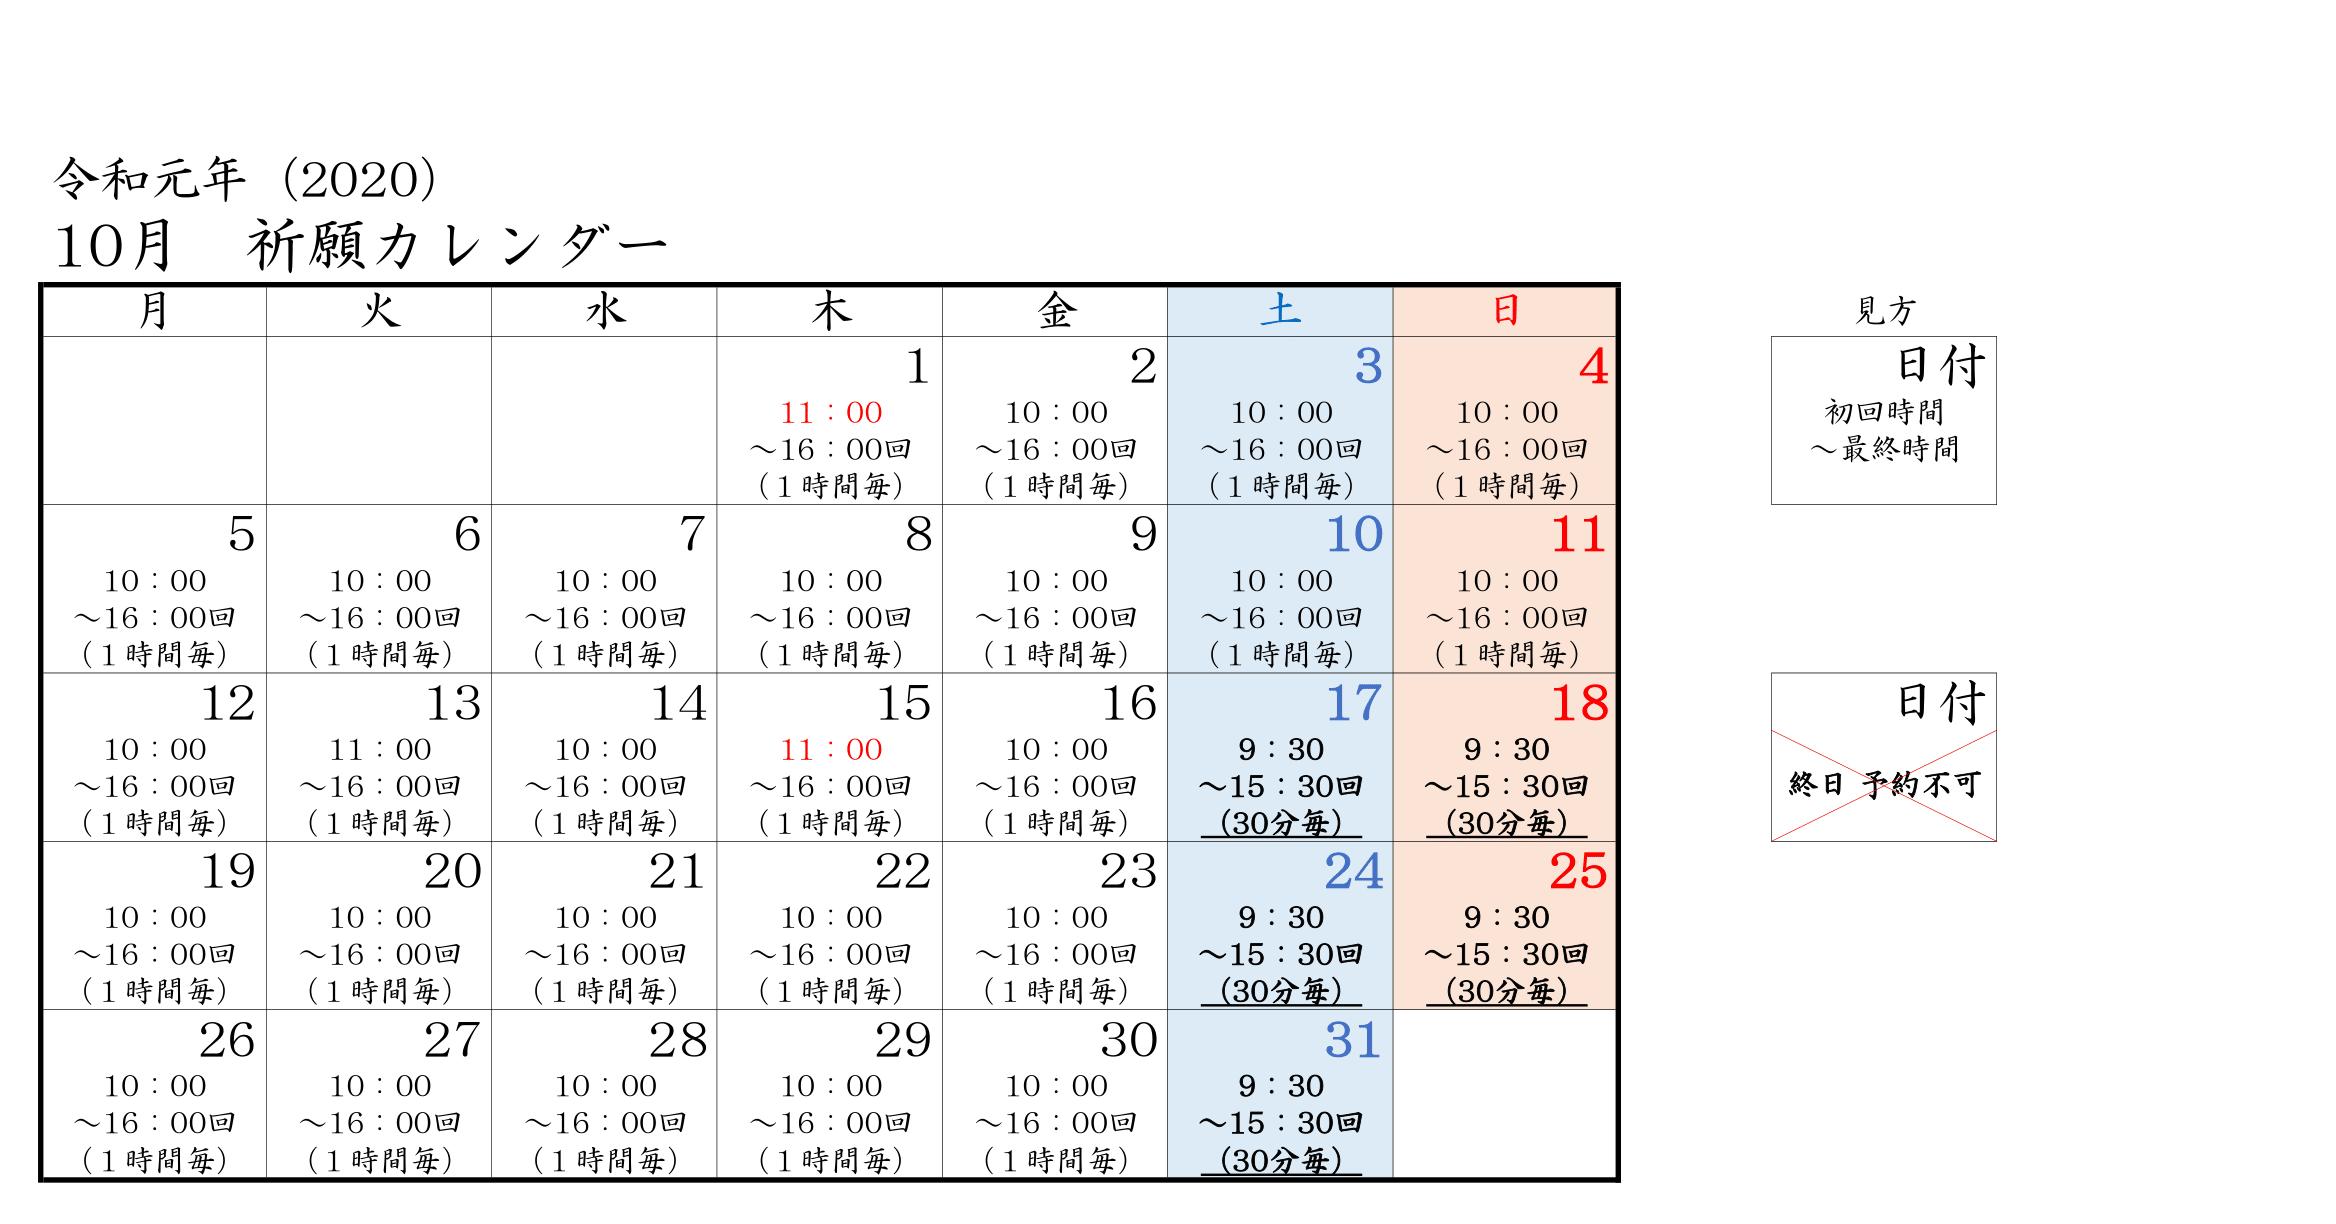 R2.10 七五三 予約カレンダー-1.png